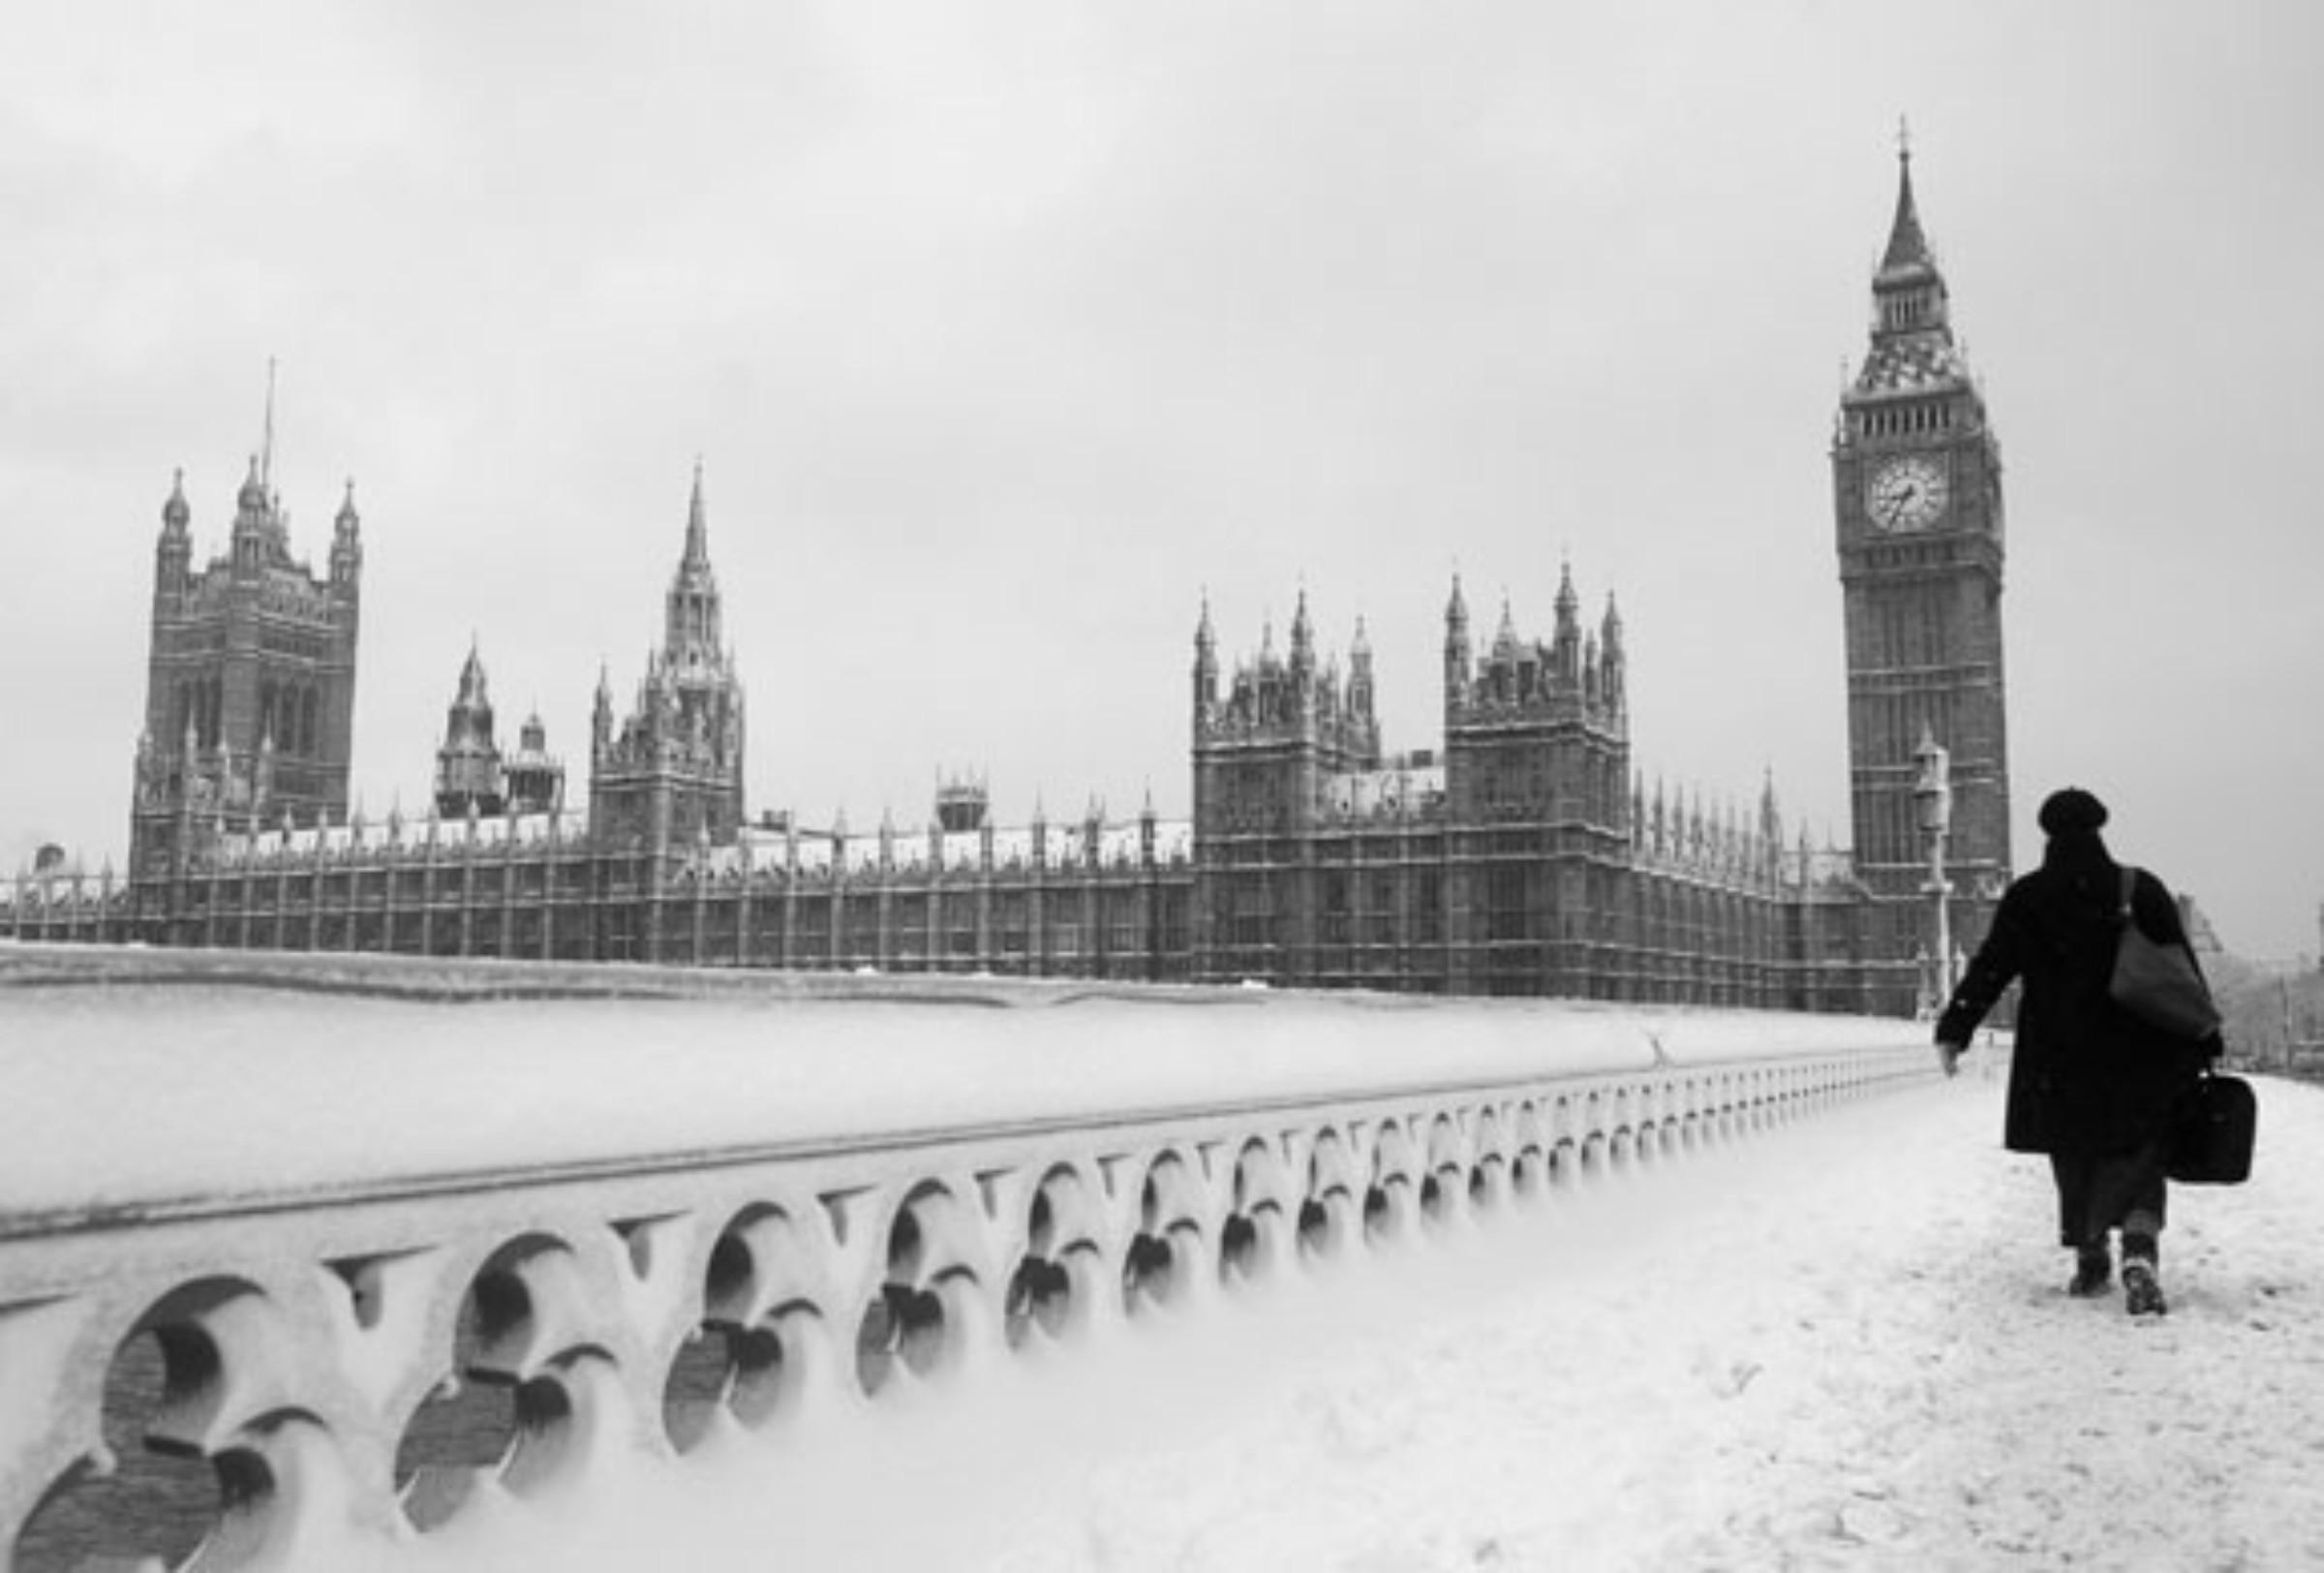 London Winter Wallpaper London Big Ben 2400x1624